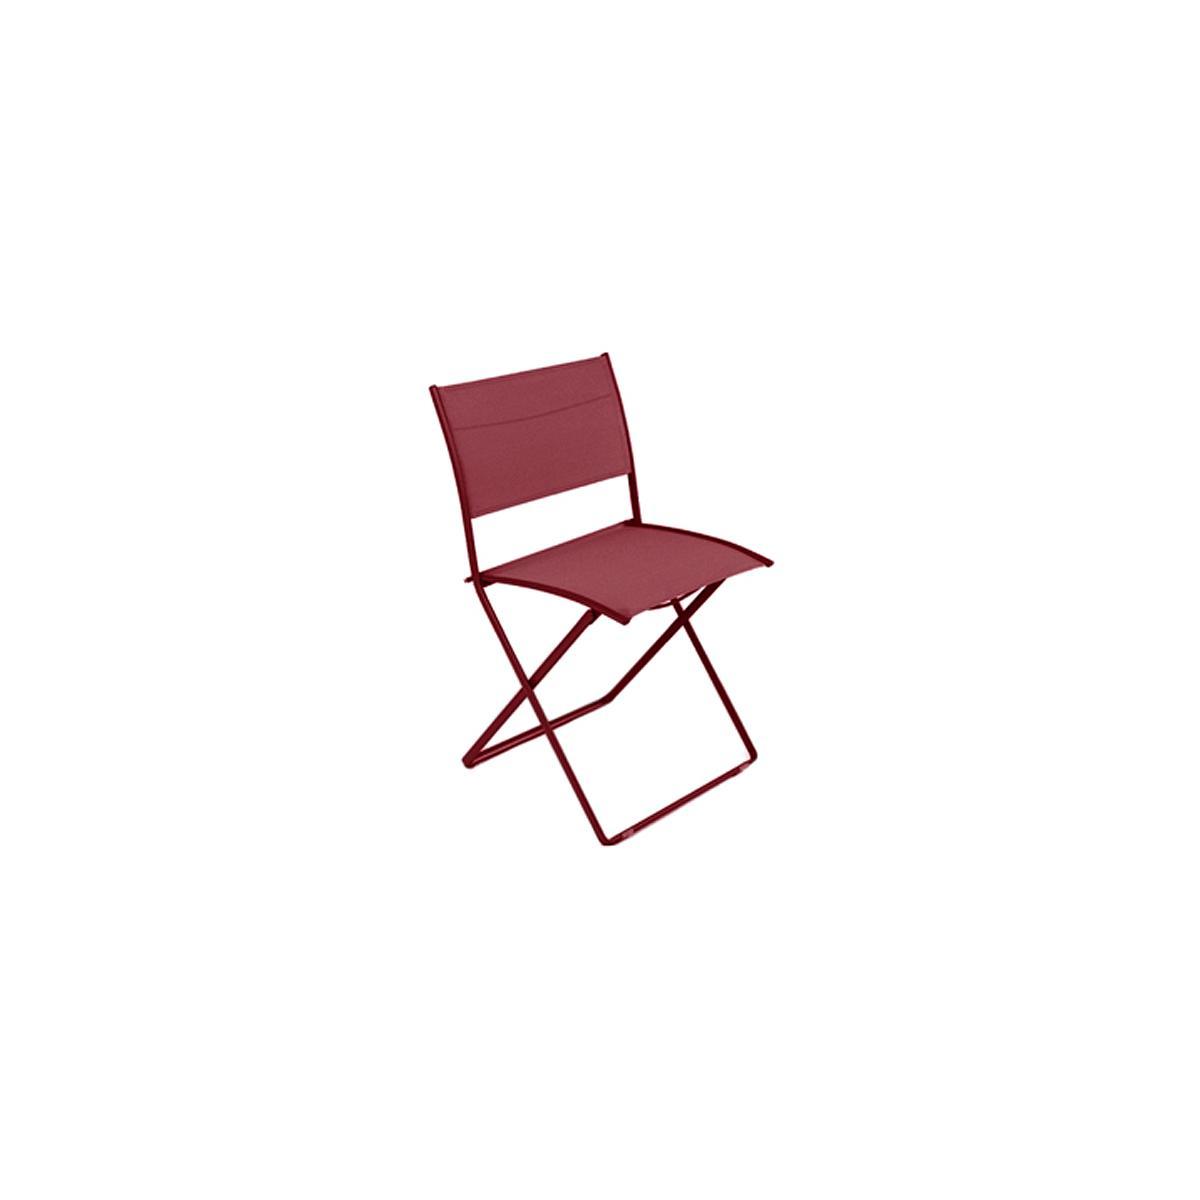 PLEIN AIR by Fermob Chaise pliante Rouge piment